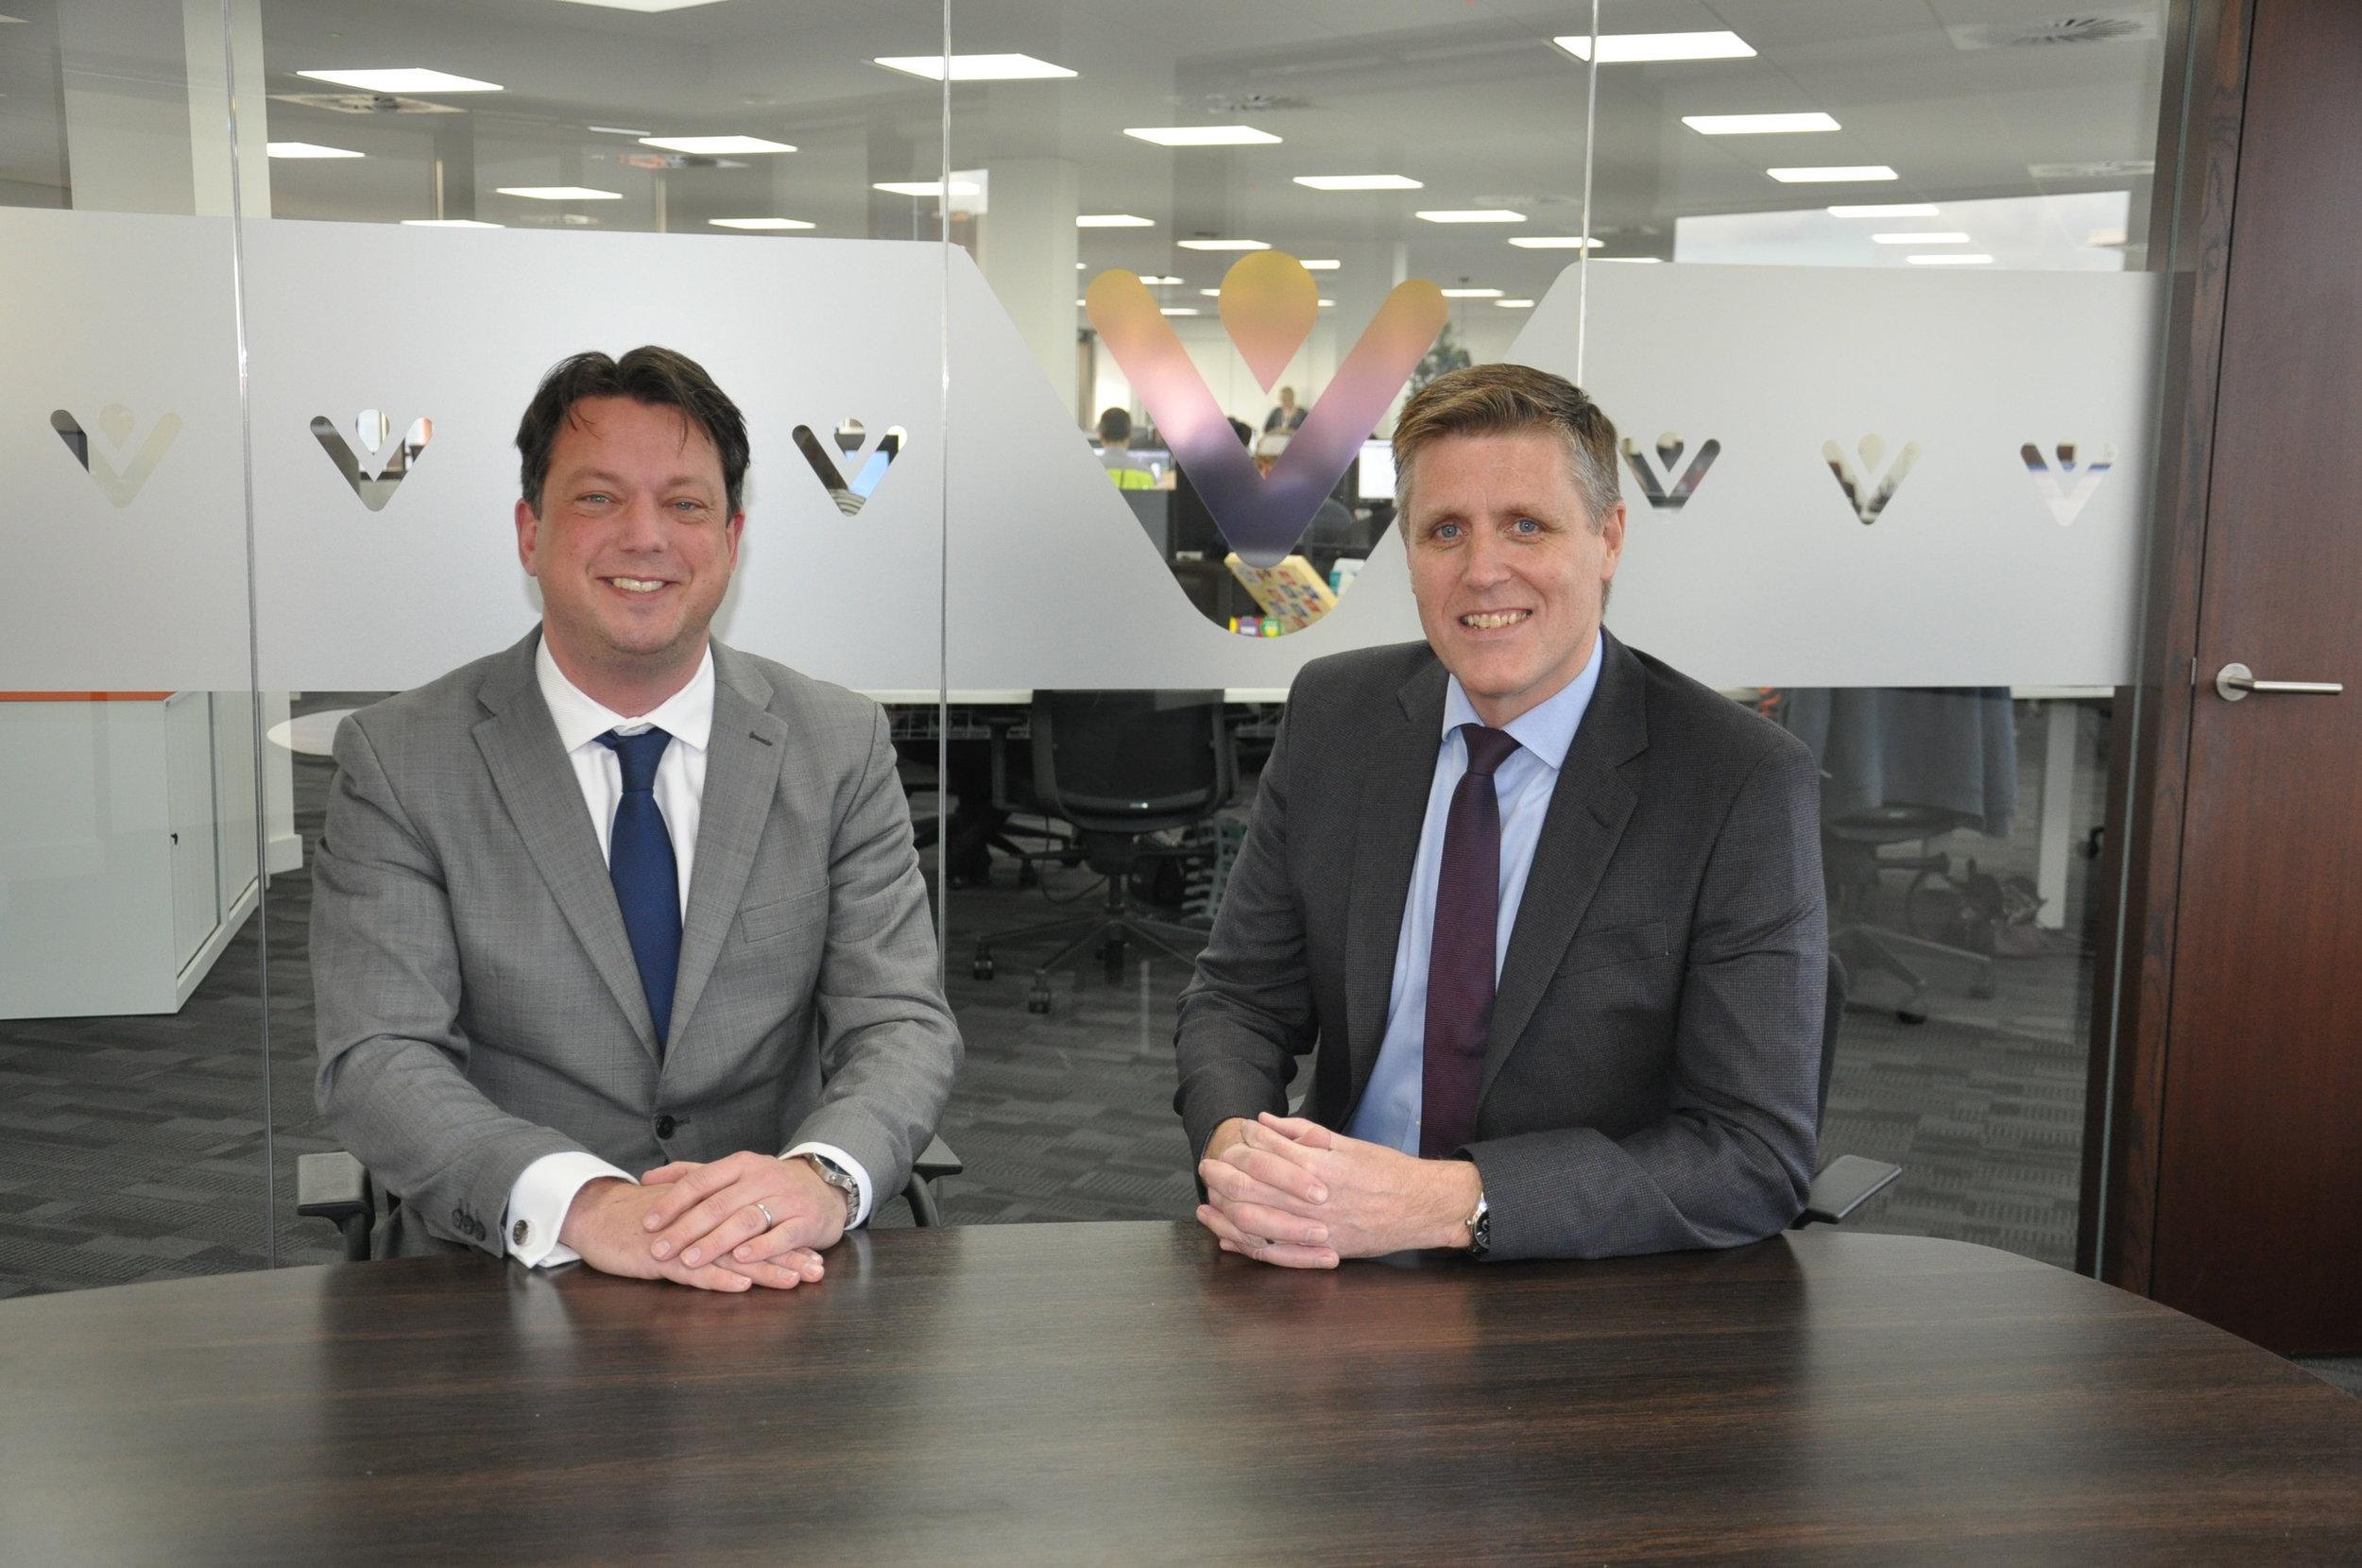 Kevin Hartshorn, Head of Assets at VIVID, & Paul Marsh, Managing Director at Resi-Safe UK